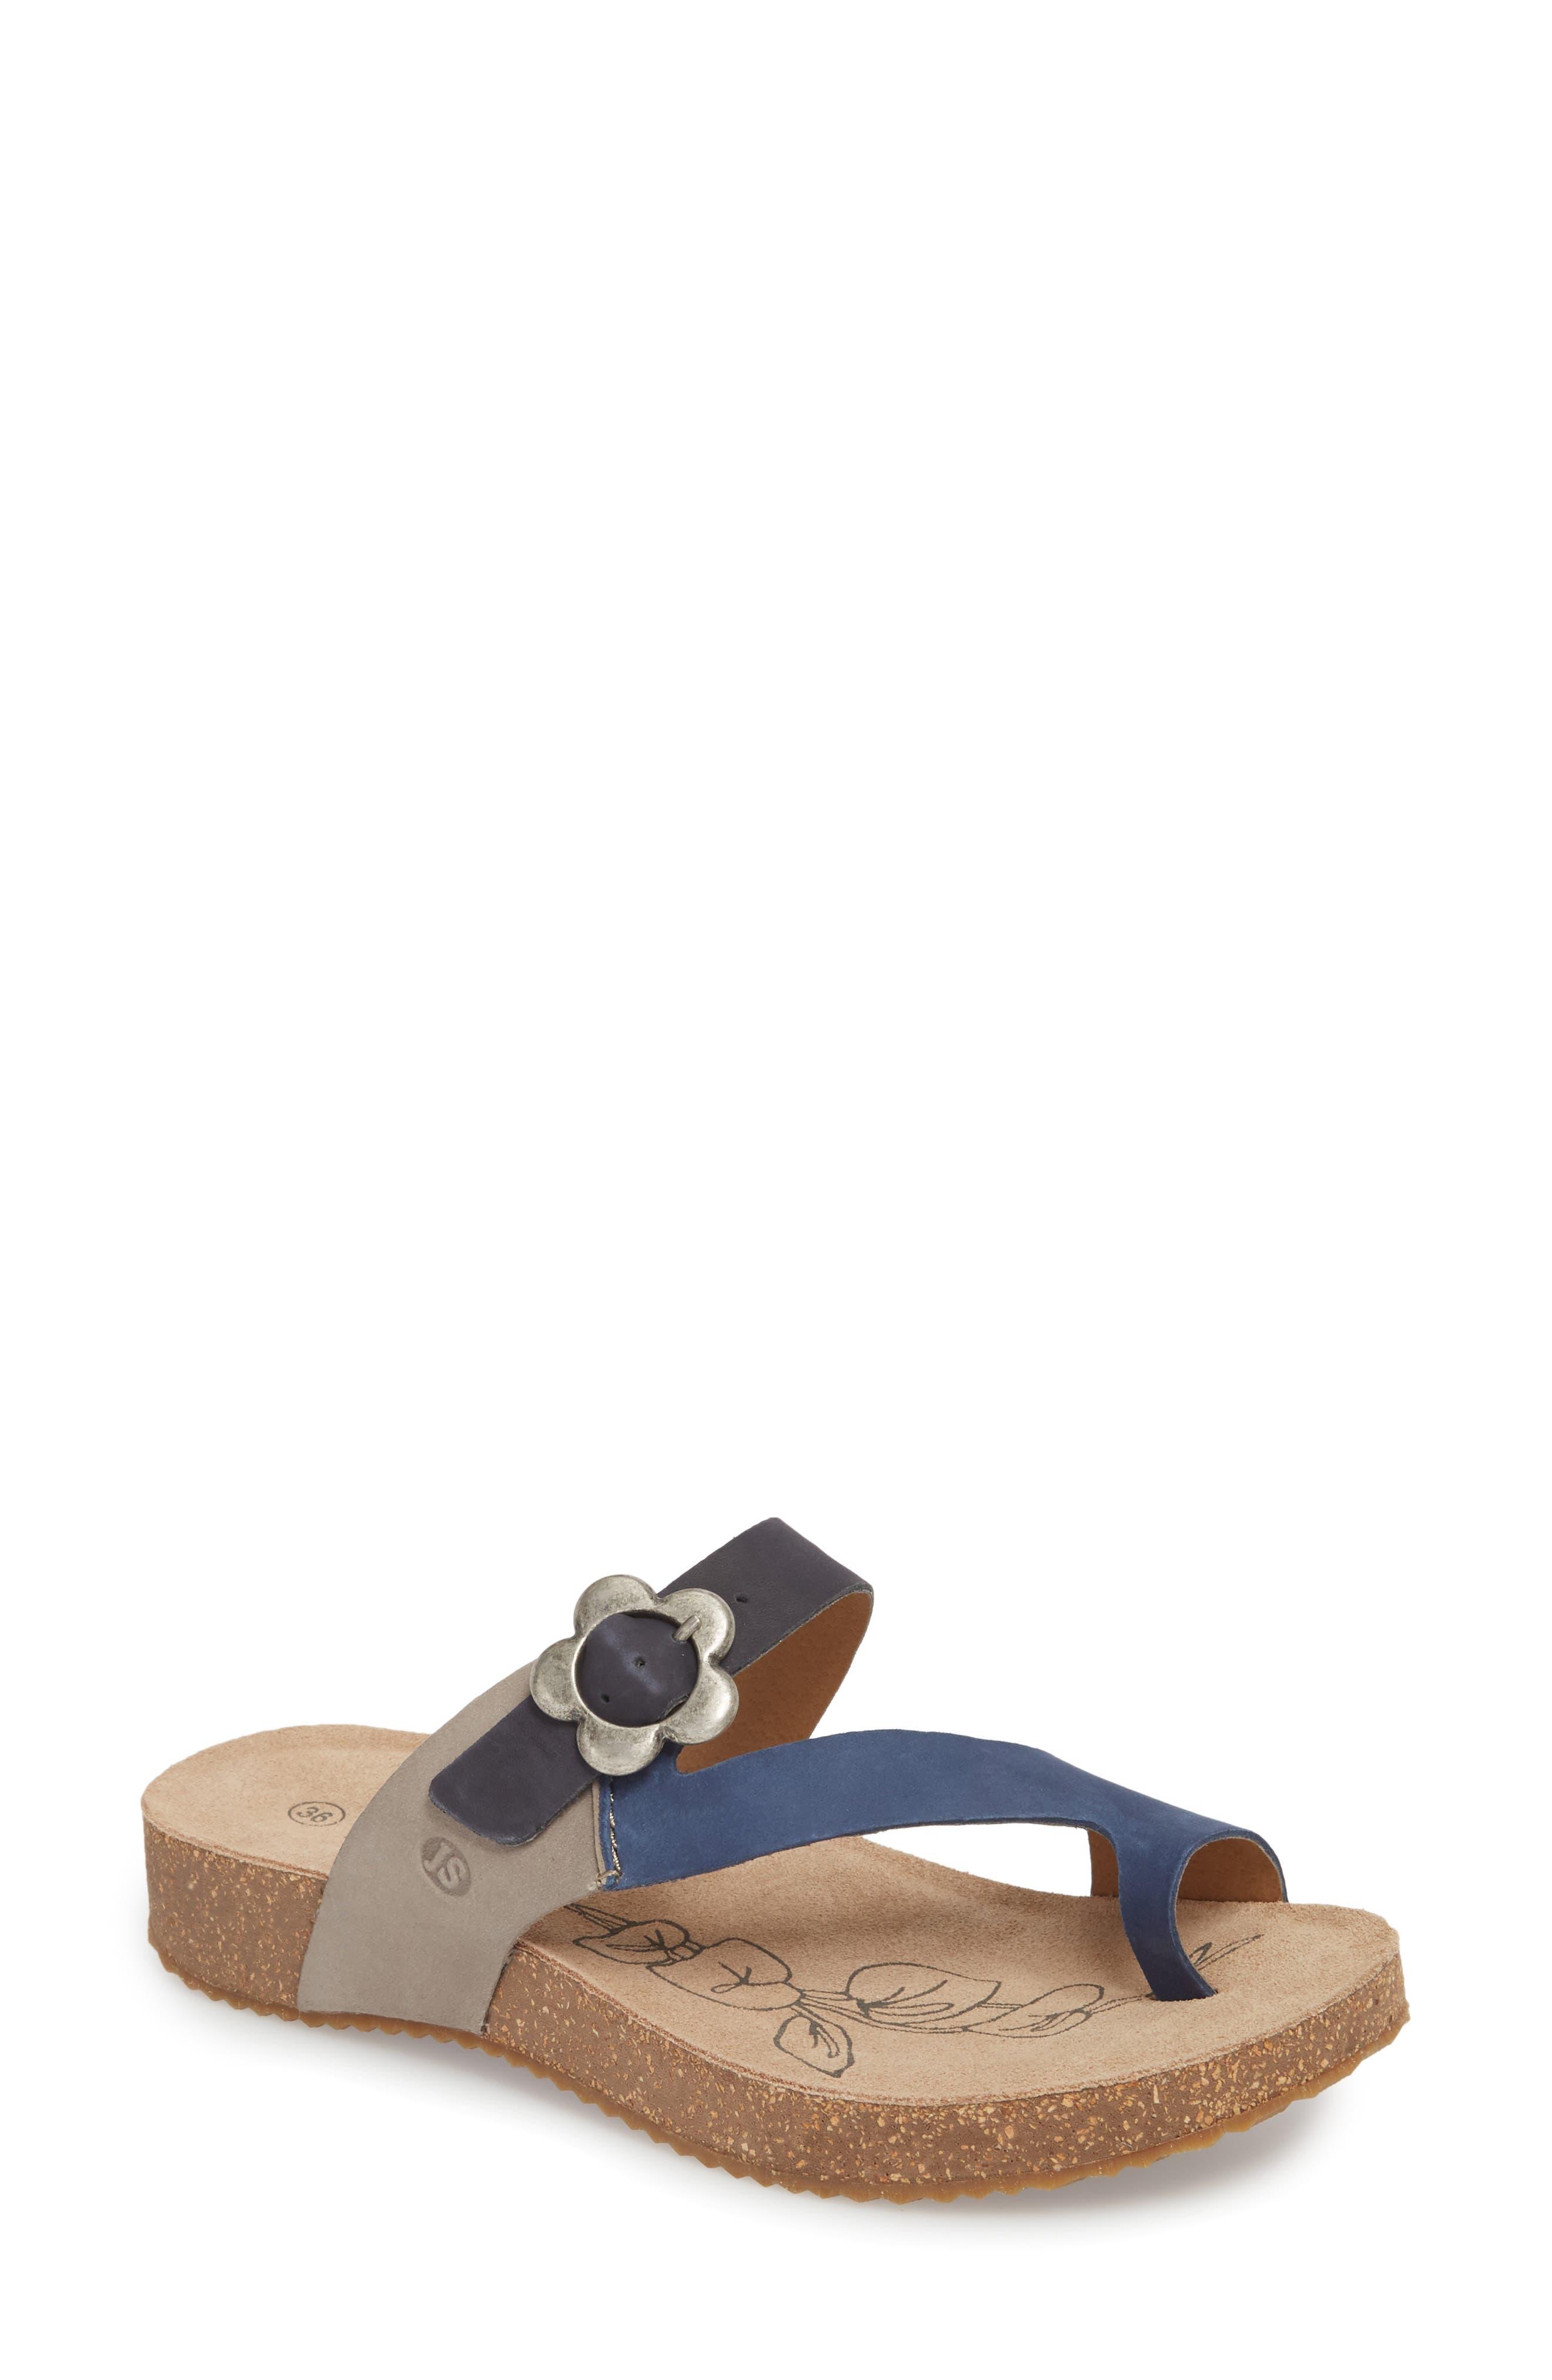 Tonga 23 Sandal,                         Main,                         color, 499